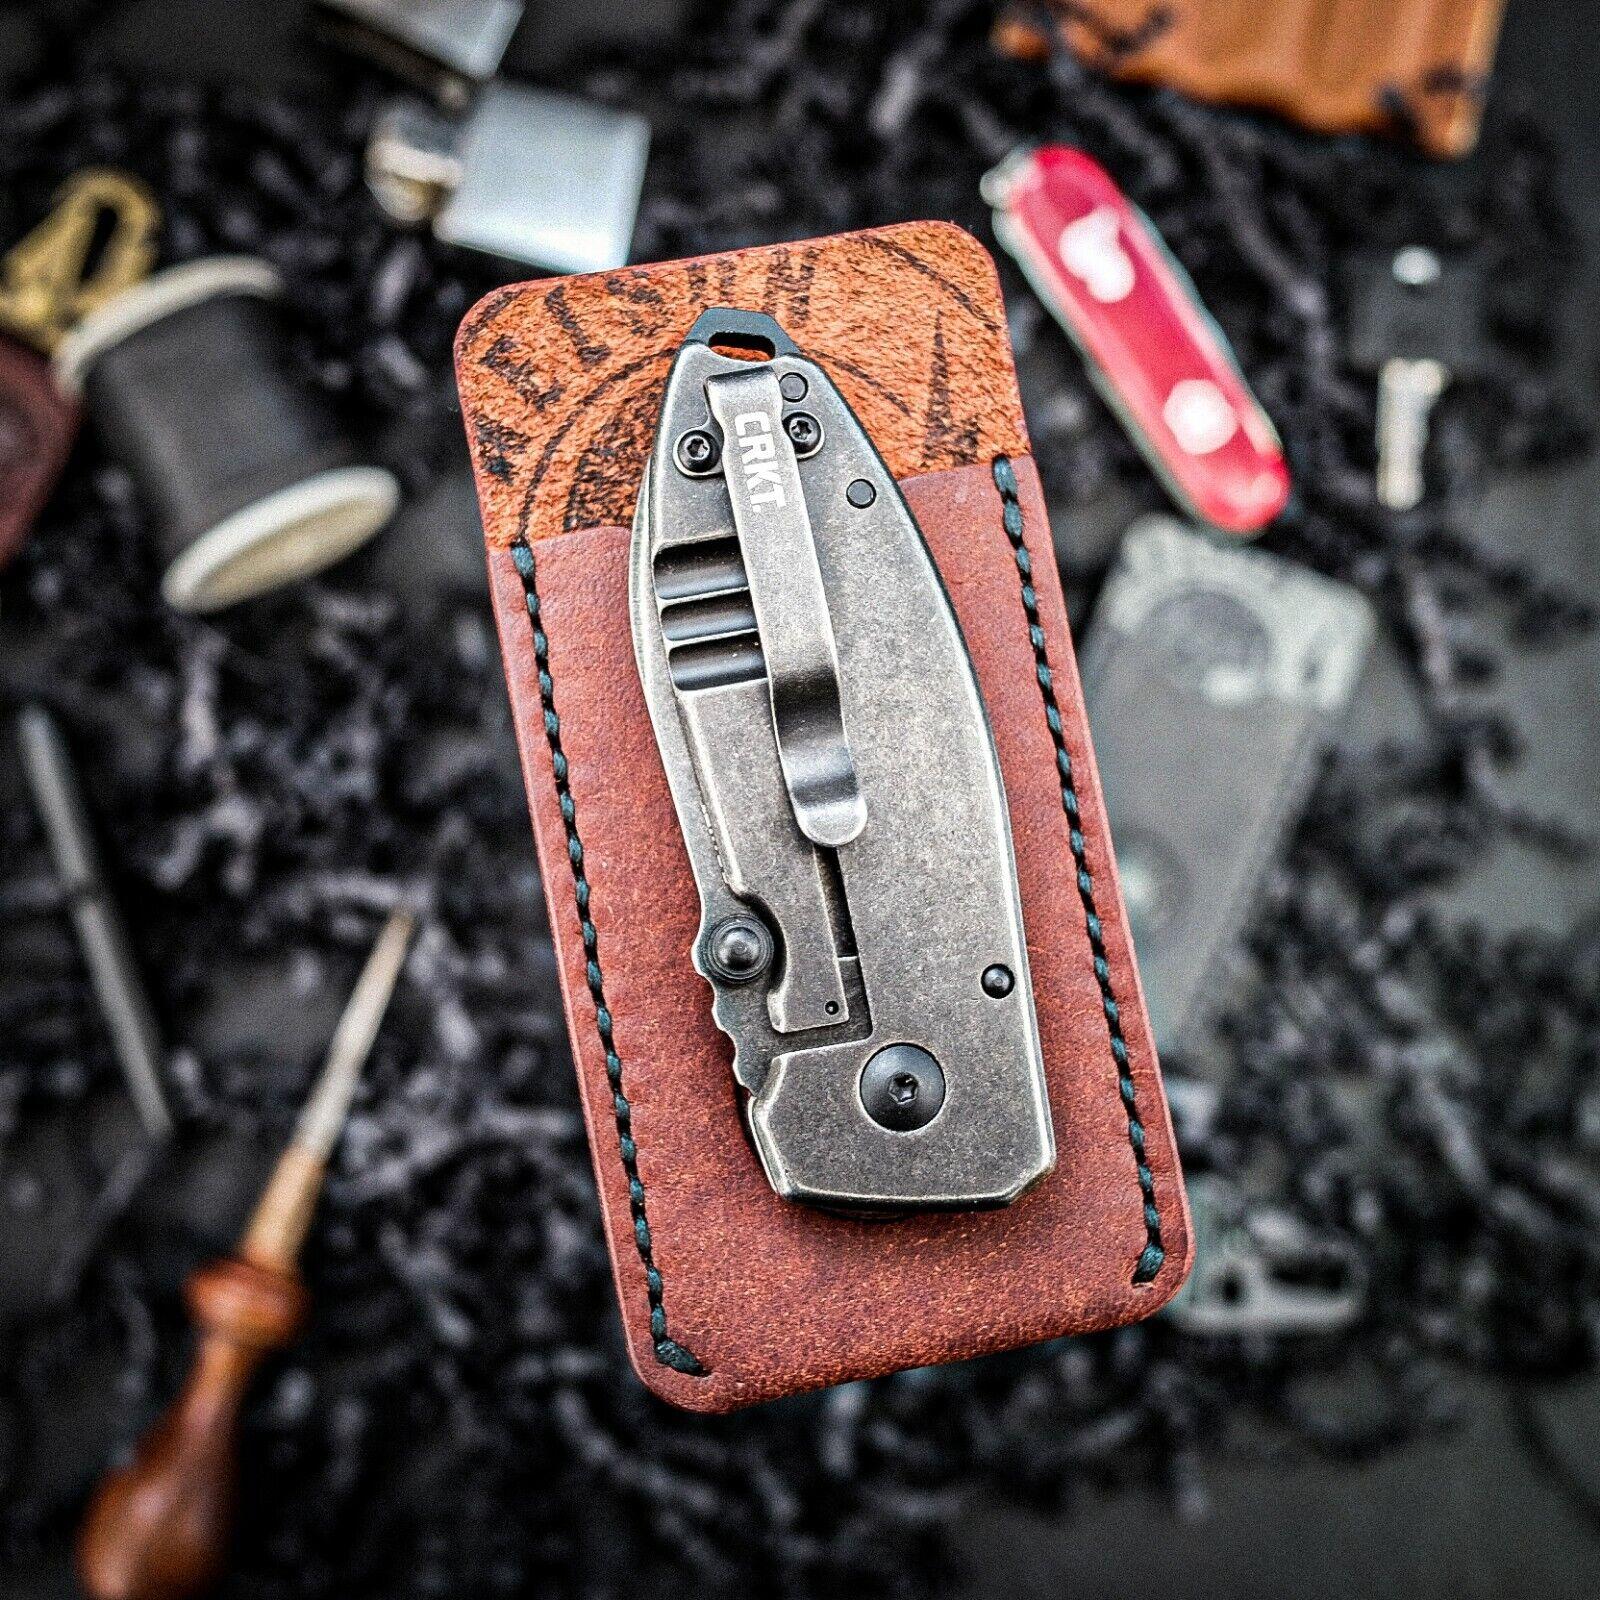 Leather EDC Multi Tool Organiser Multi-Tool Cover, Every Day Carry Organiser